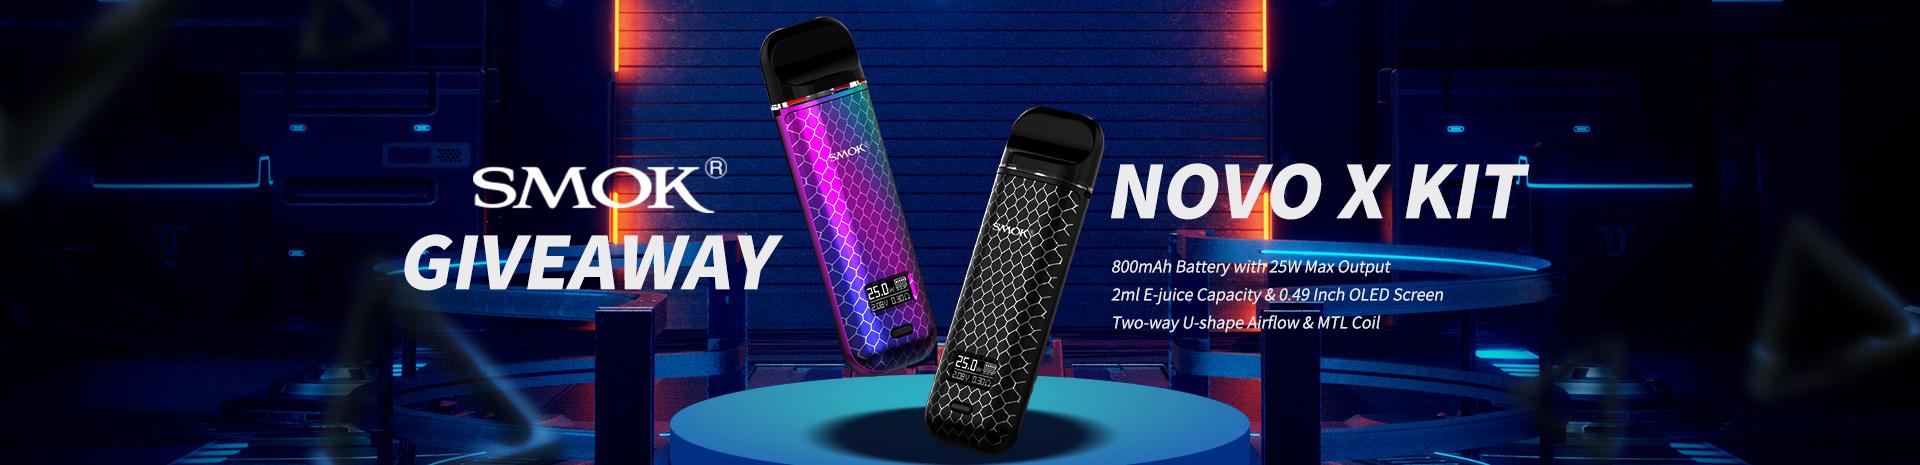 SMOK Novo X Kit Giveaway